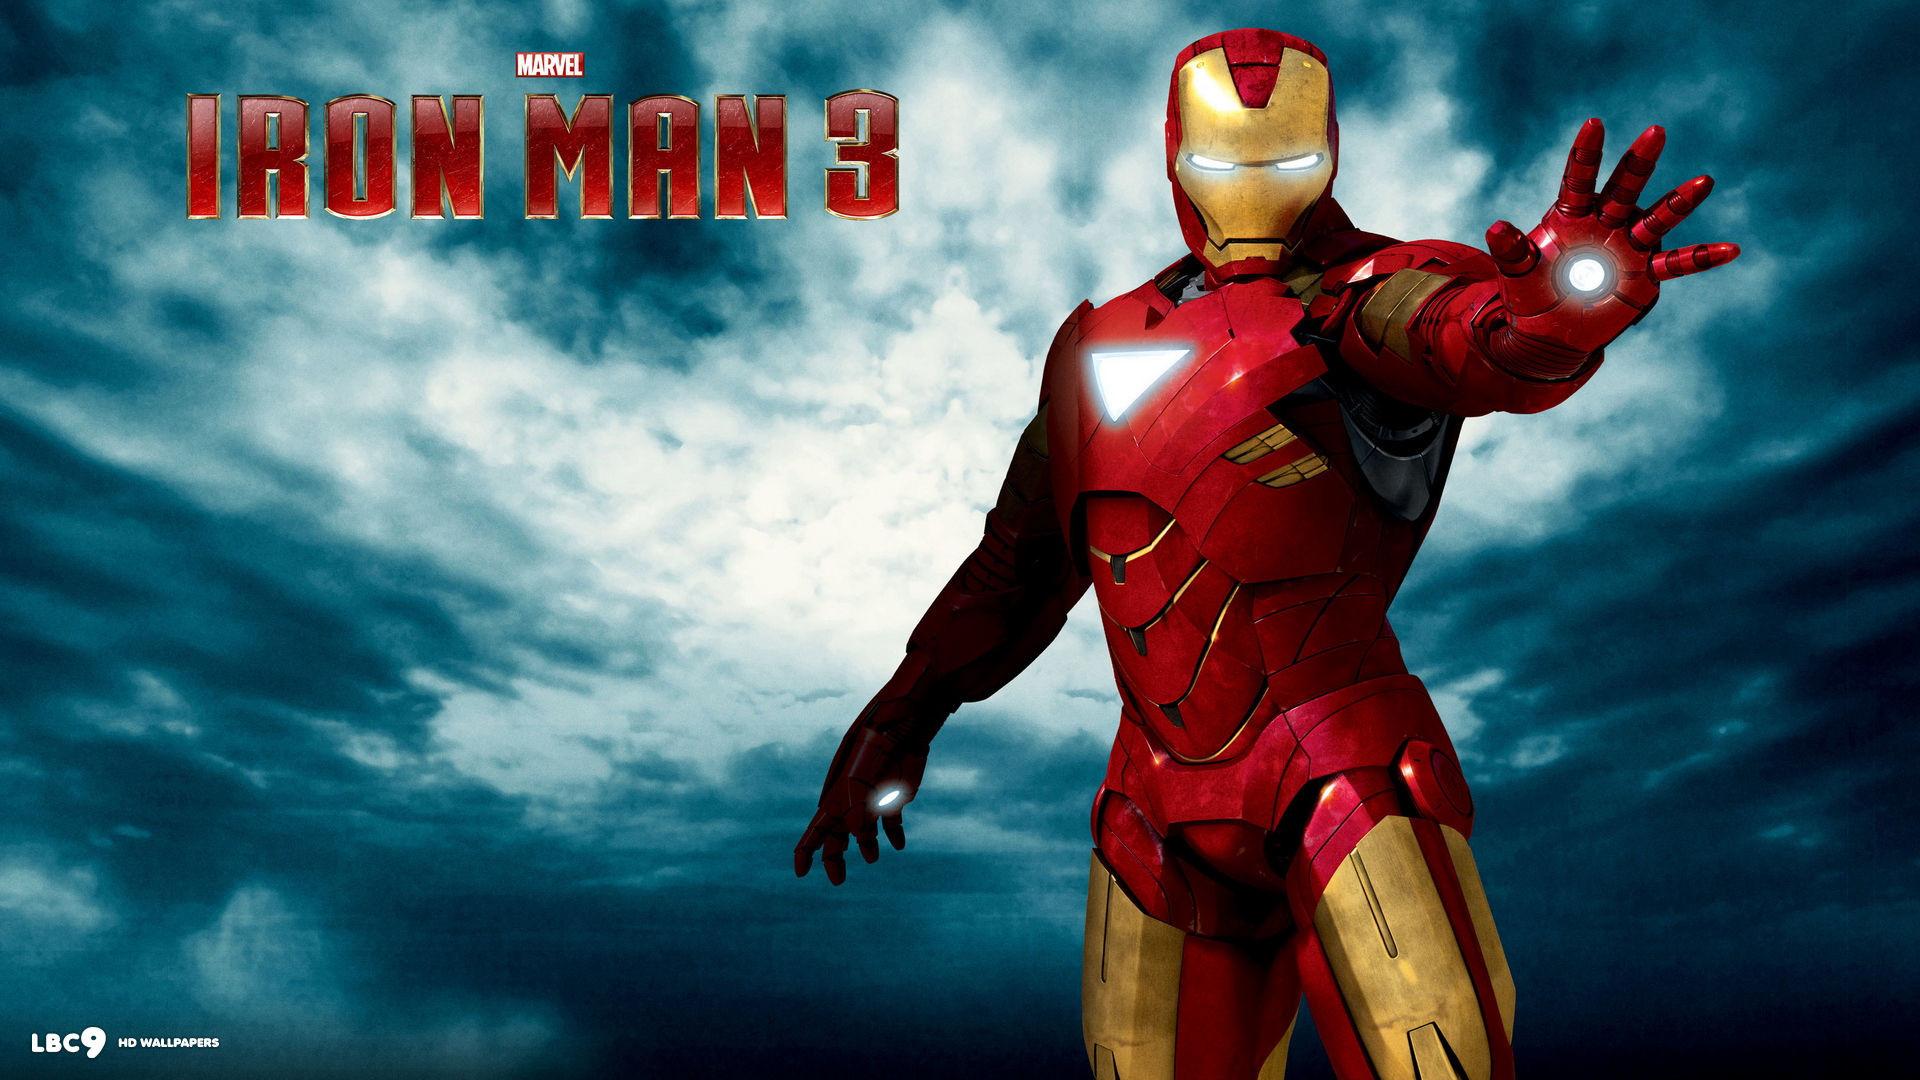 iron man 3 superhero wallpaper hd 1080p